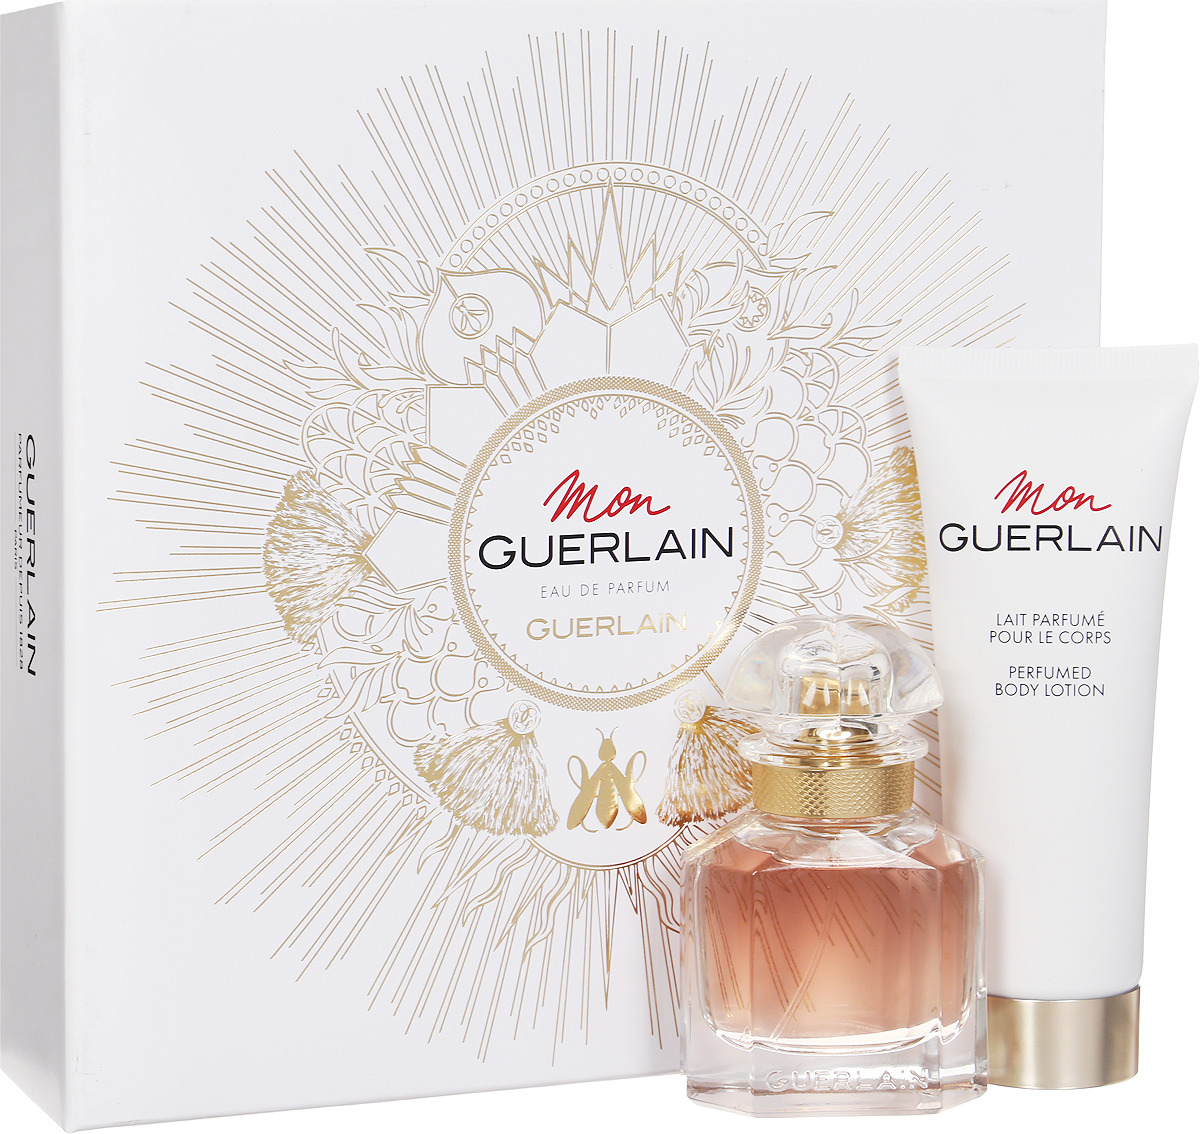 Парфюмированный набор Guerlain Mon Lady: парфюмерная вода, 30 мл + лосьон, 75